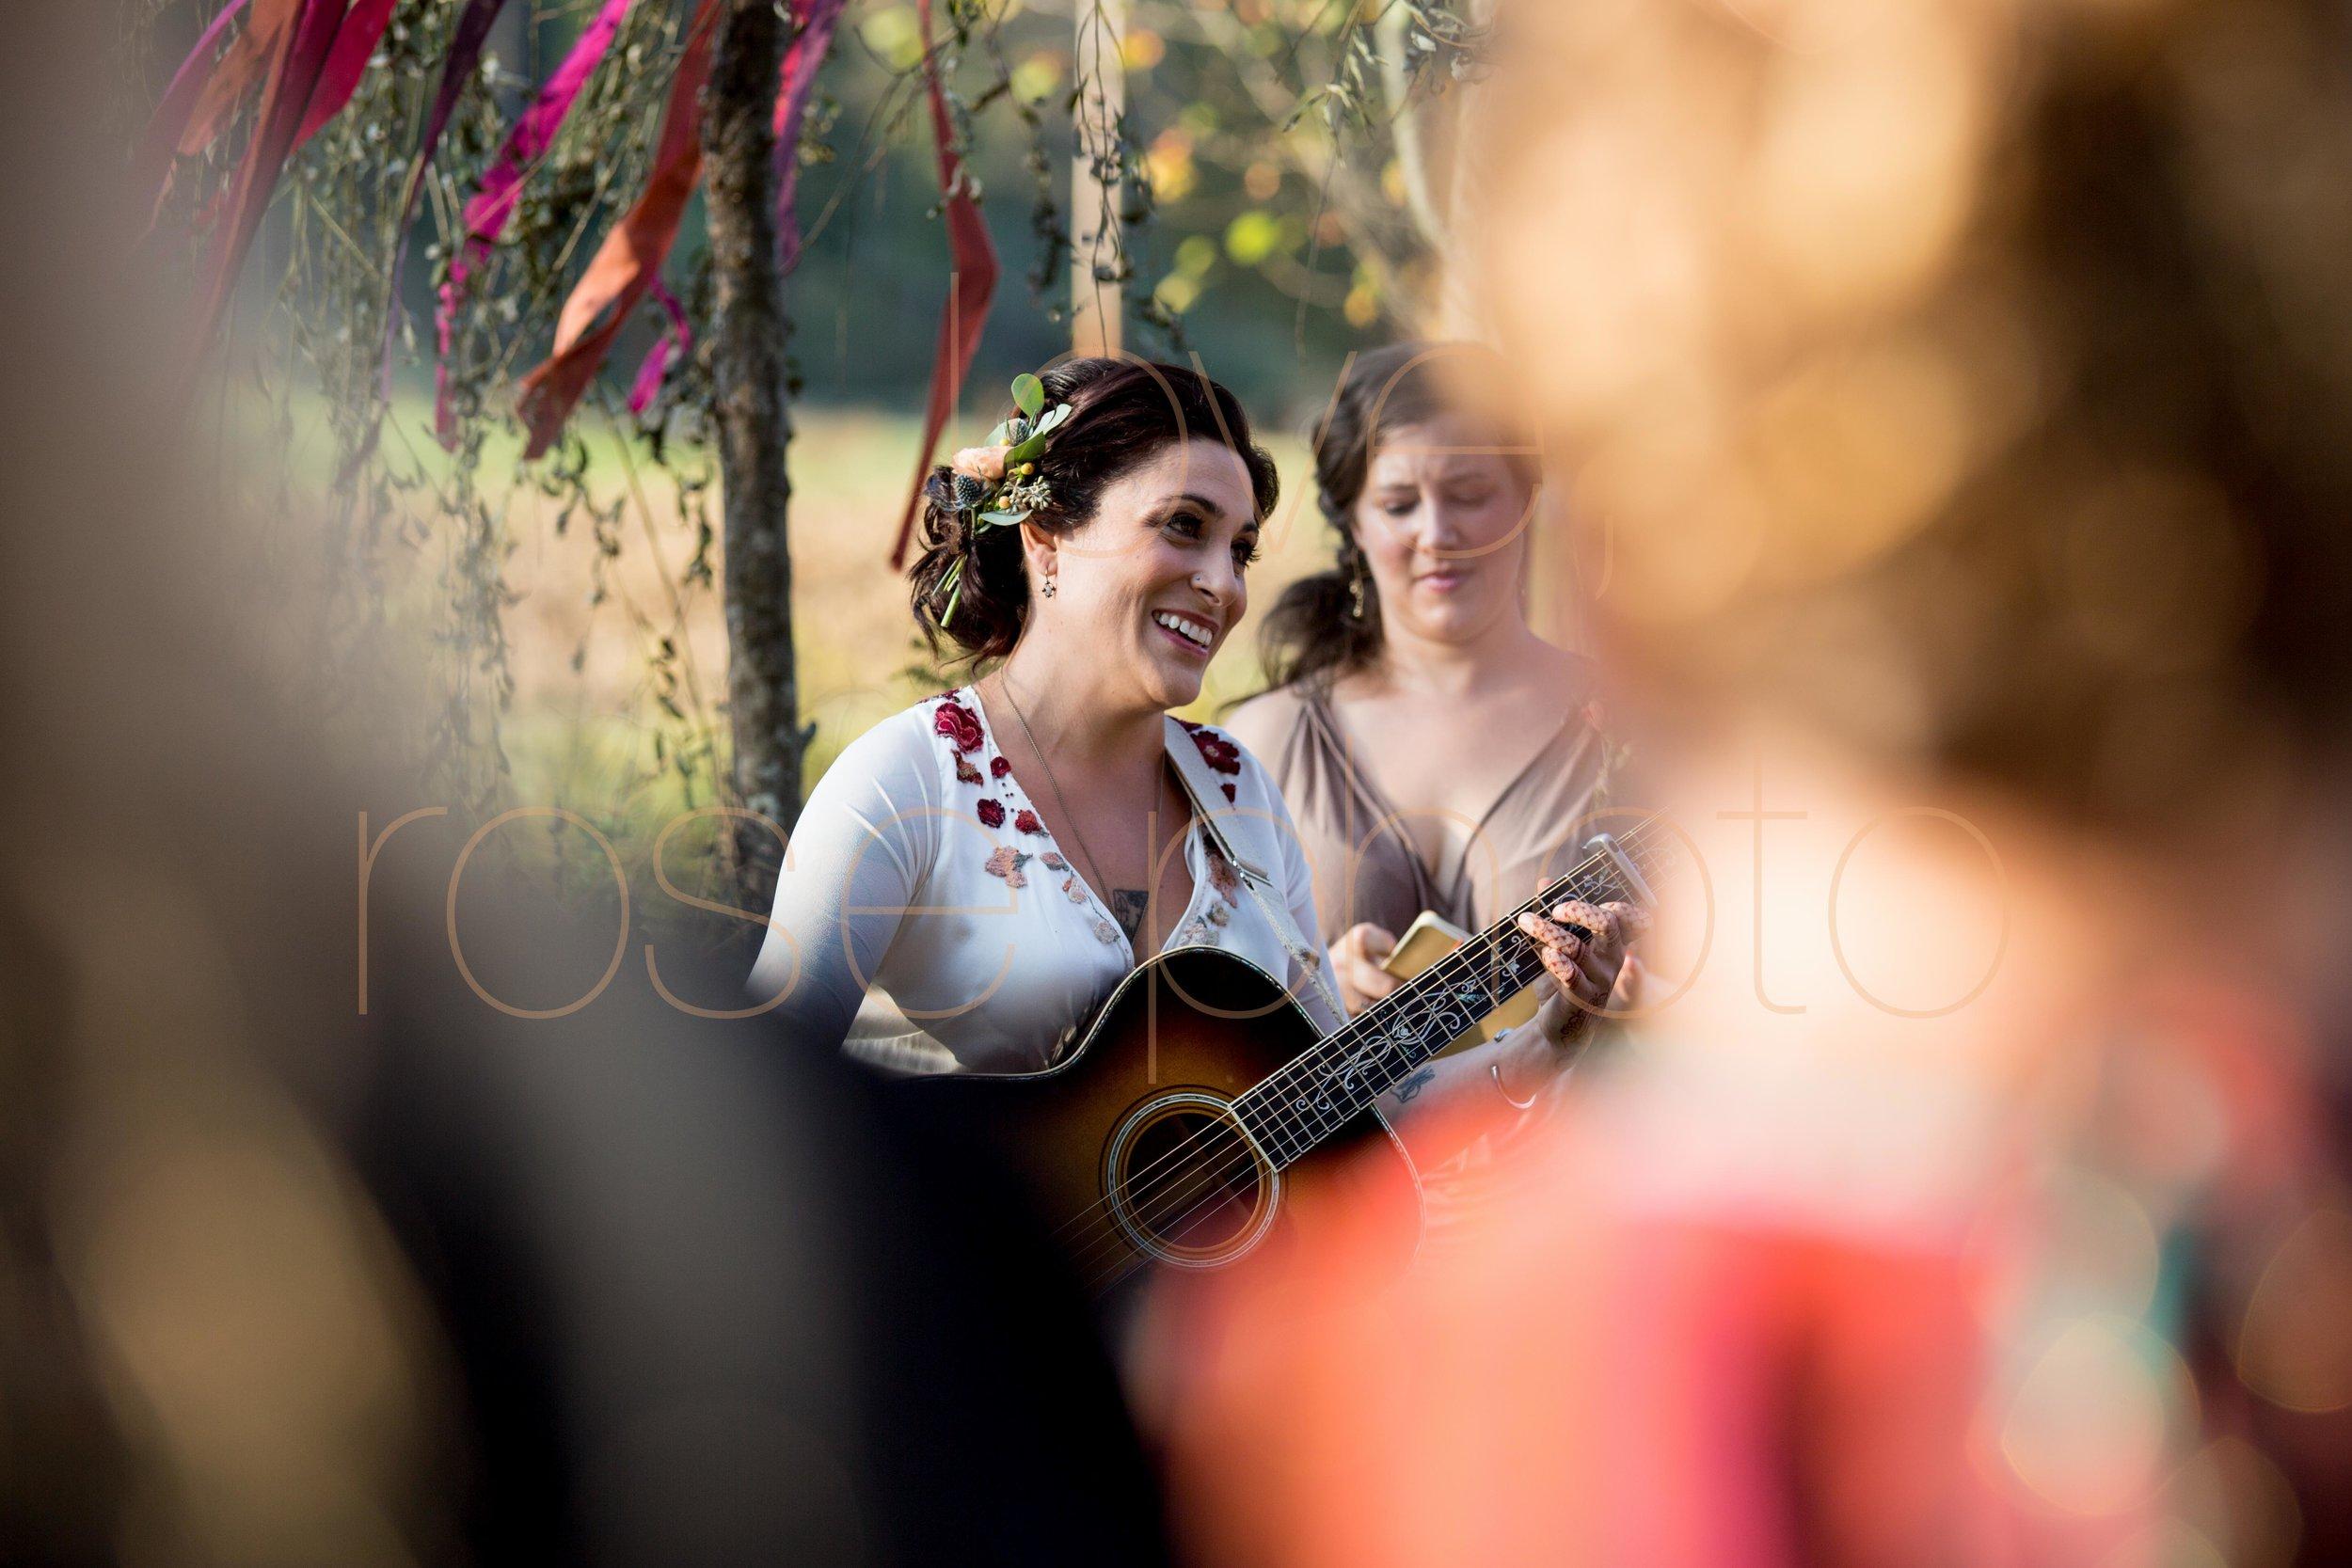 Jane Krame + Jason Ashevegas married asheville best wedding photographers -46.jpg